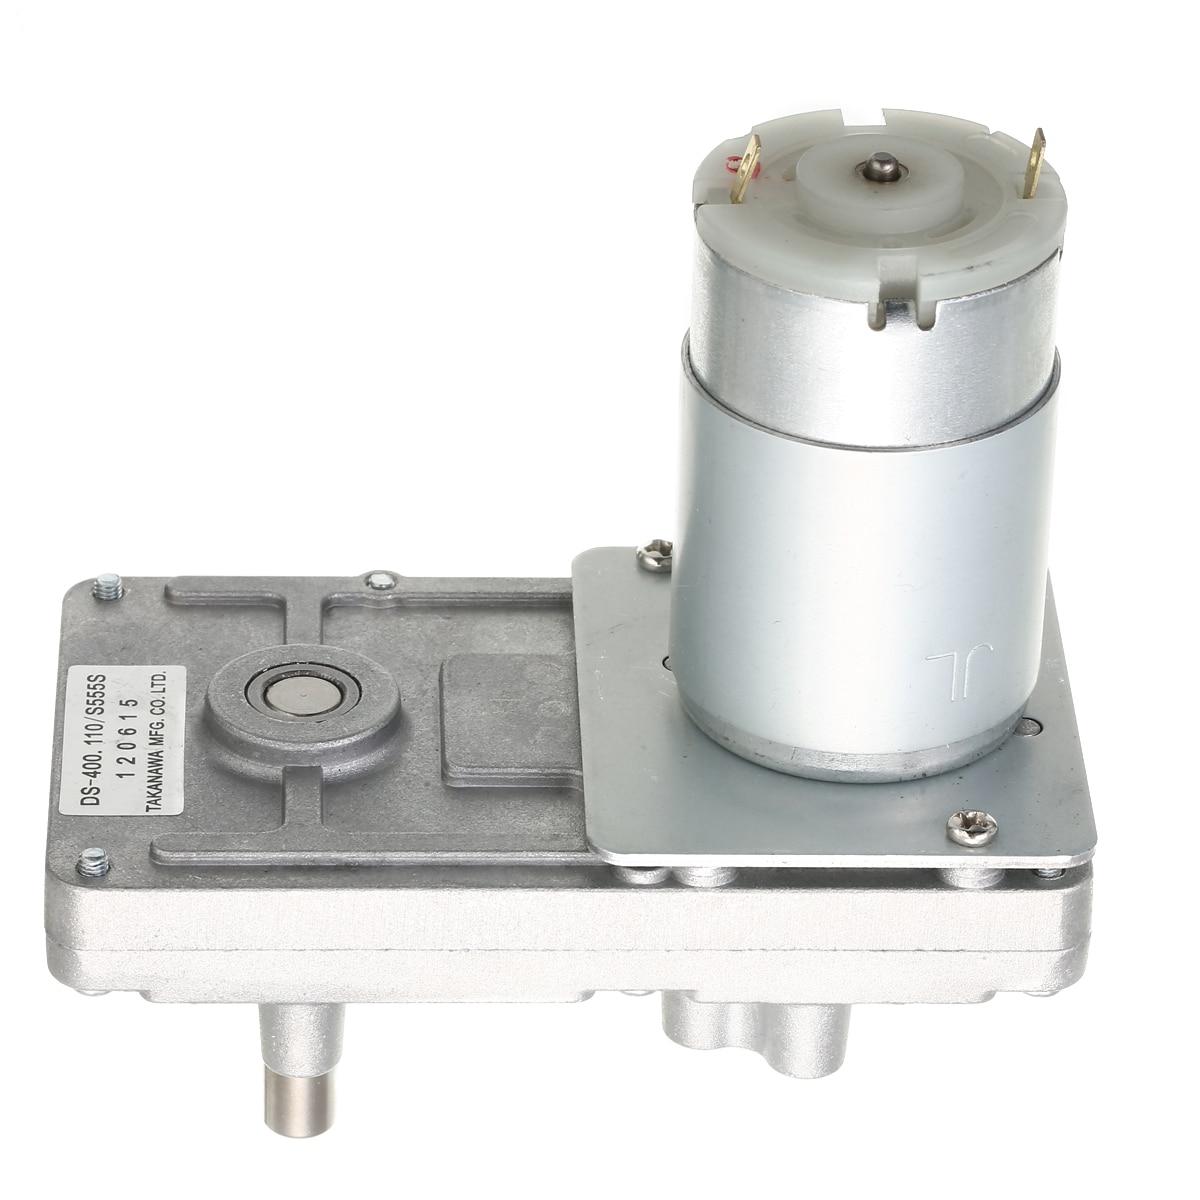 Low Noise popcorn machines DC Gear Motor Motors model tanks DC High Practical